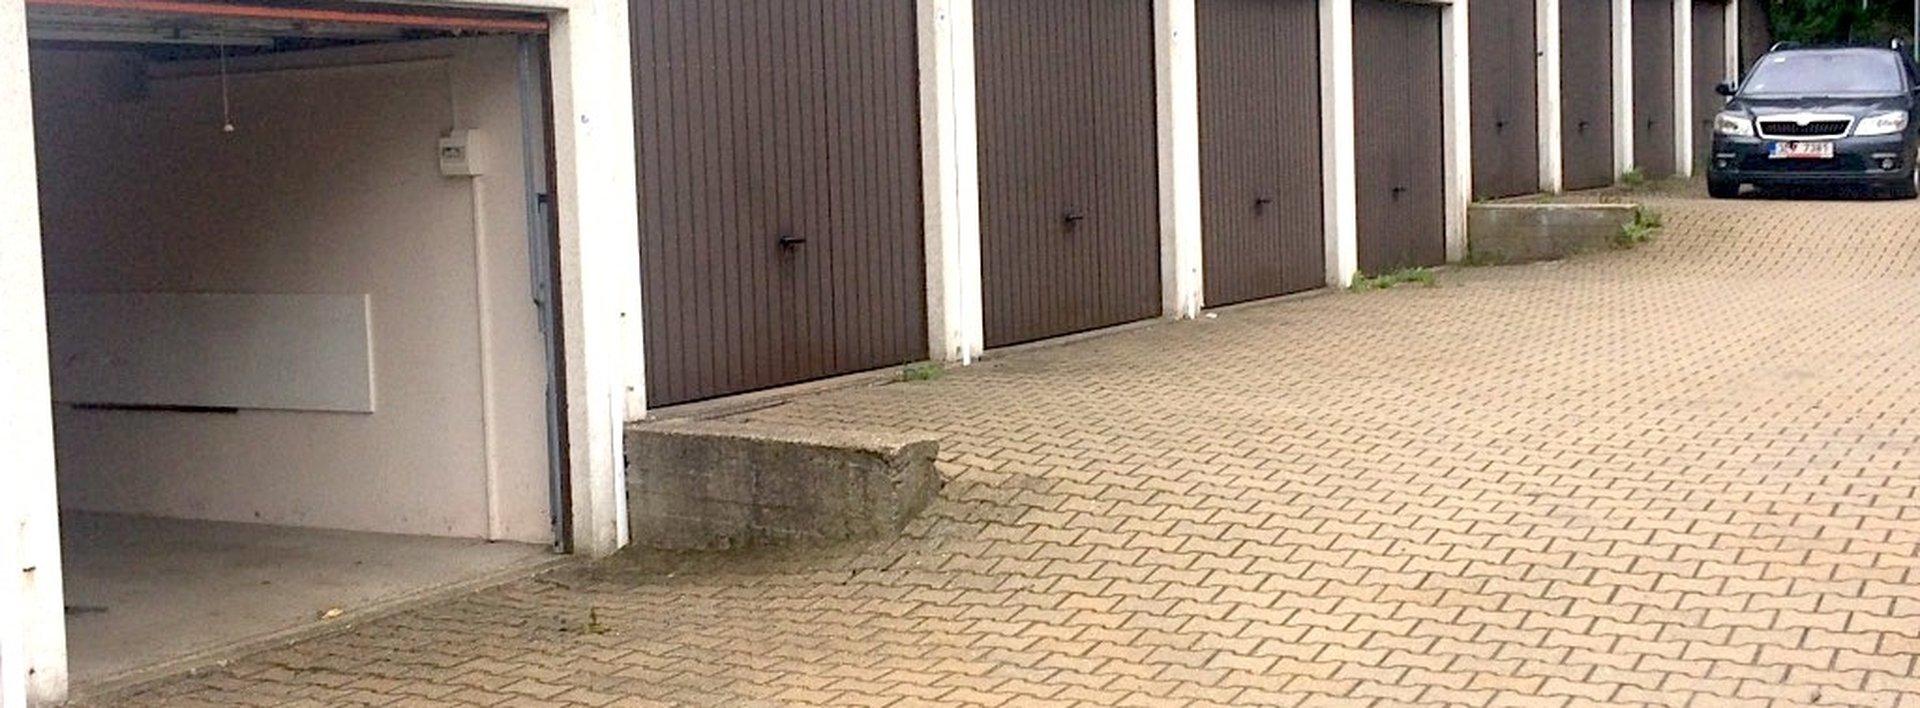 Pronájem garáže 16m2 - Liberec, Doubí, ul. Hůlkova, Ev.č.: N48196